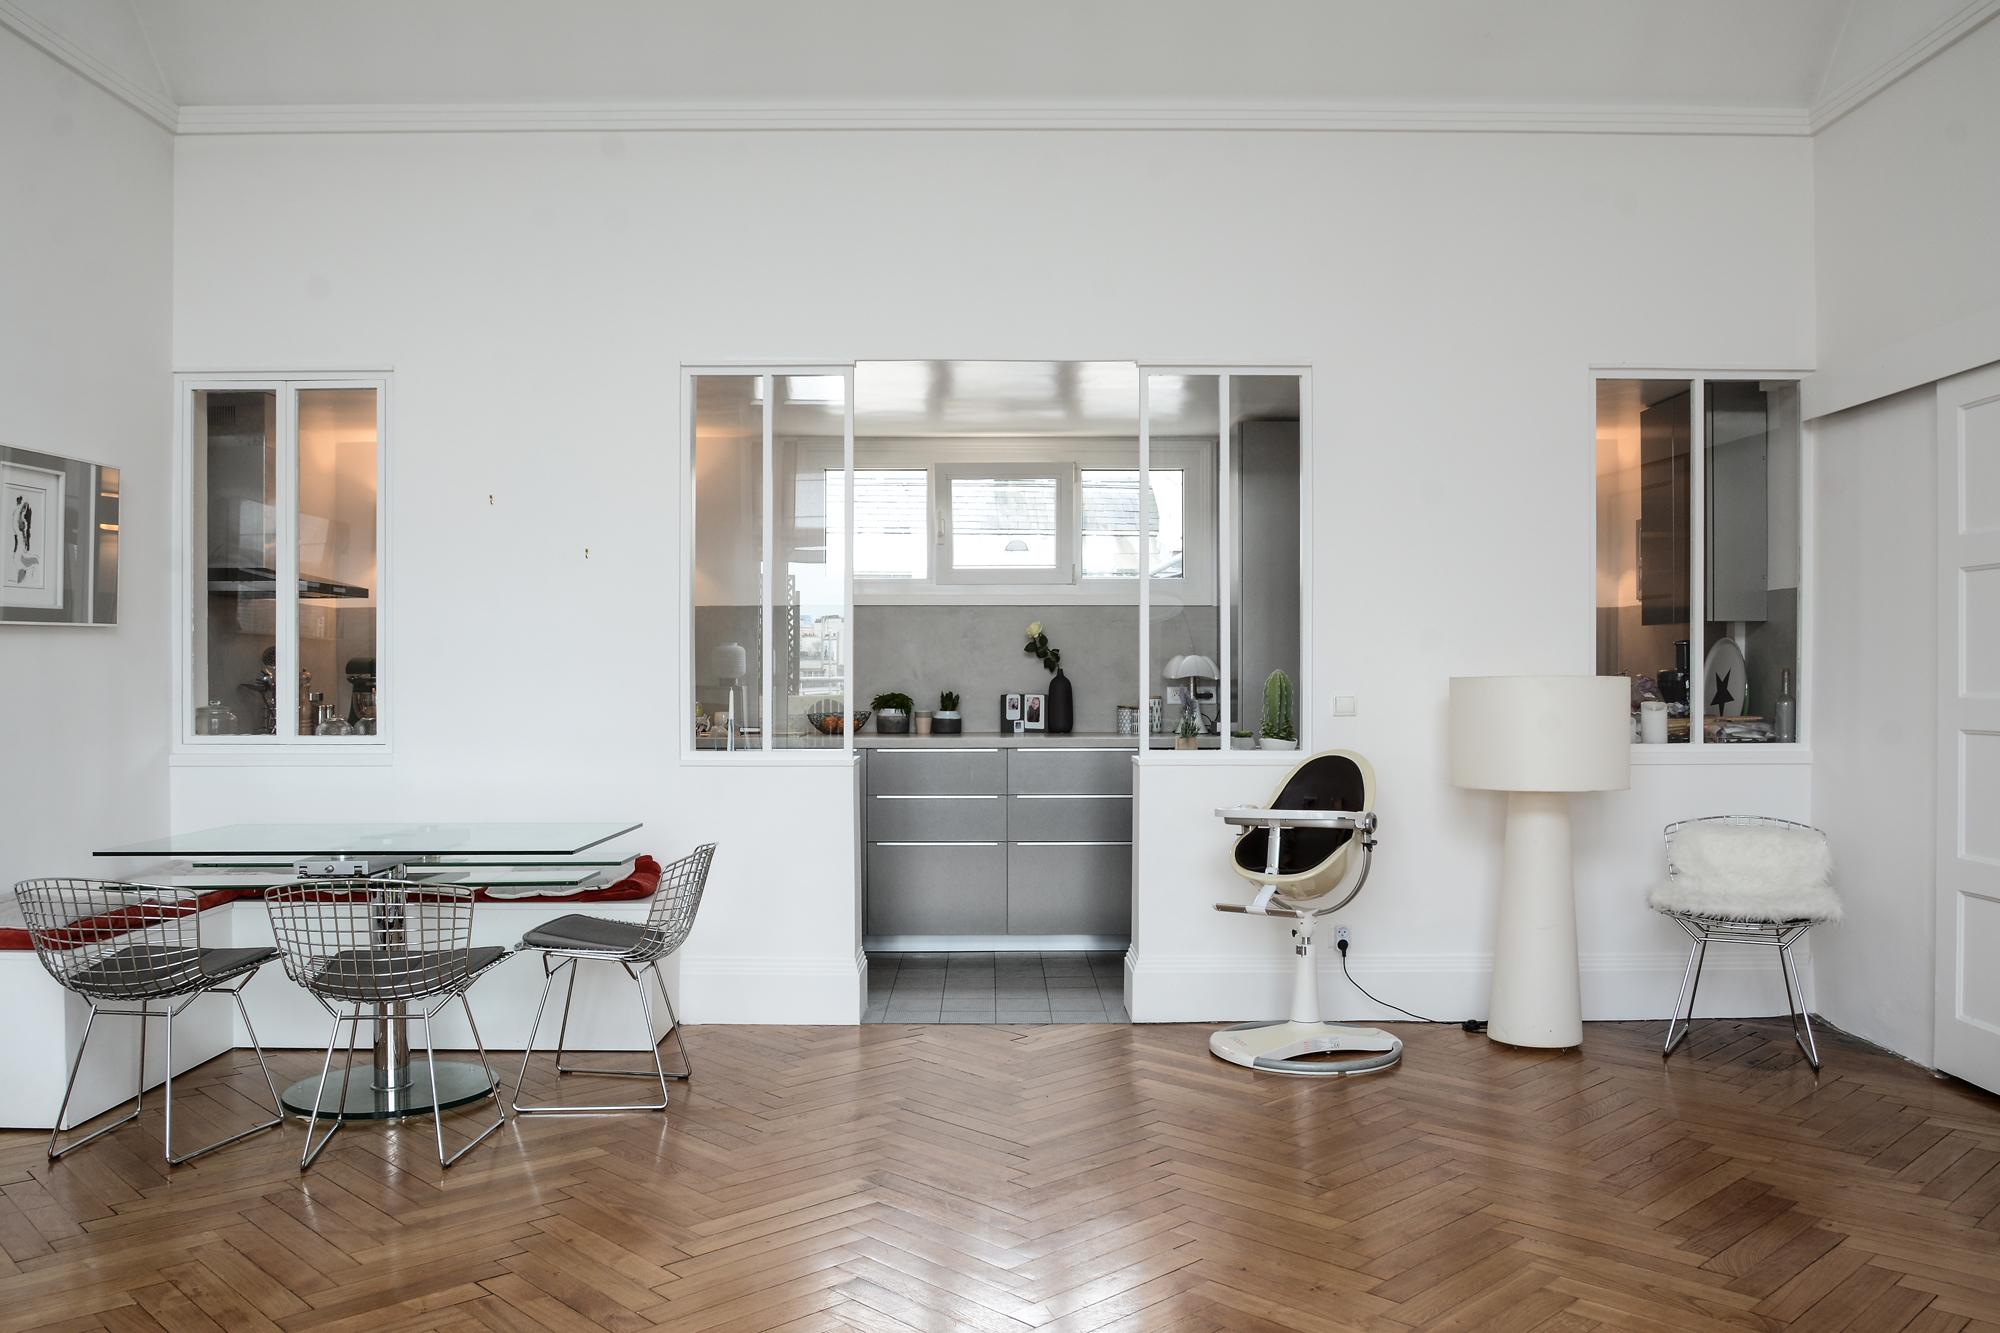 nicolasvade_architecture_interieur_design_paris_bineau_14.jpg